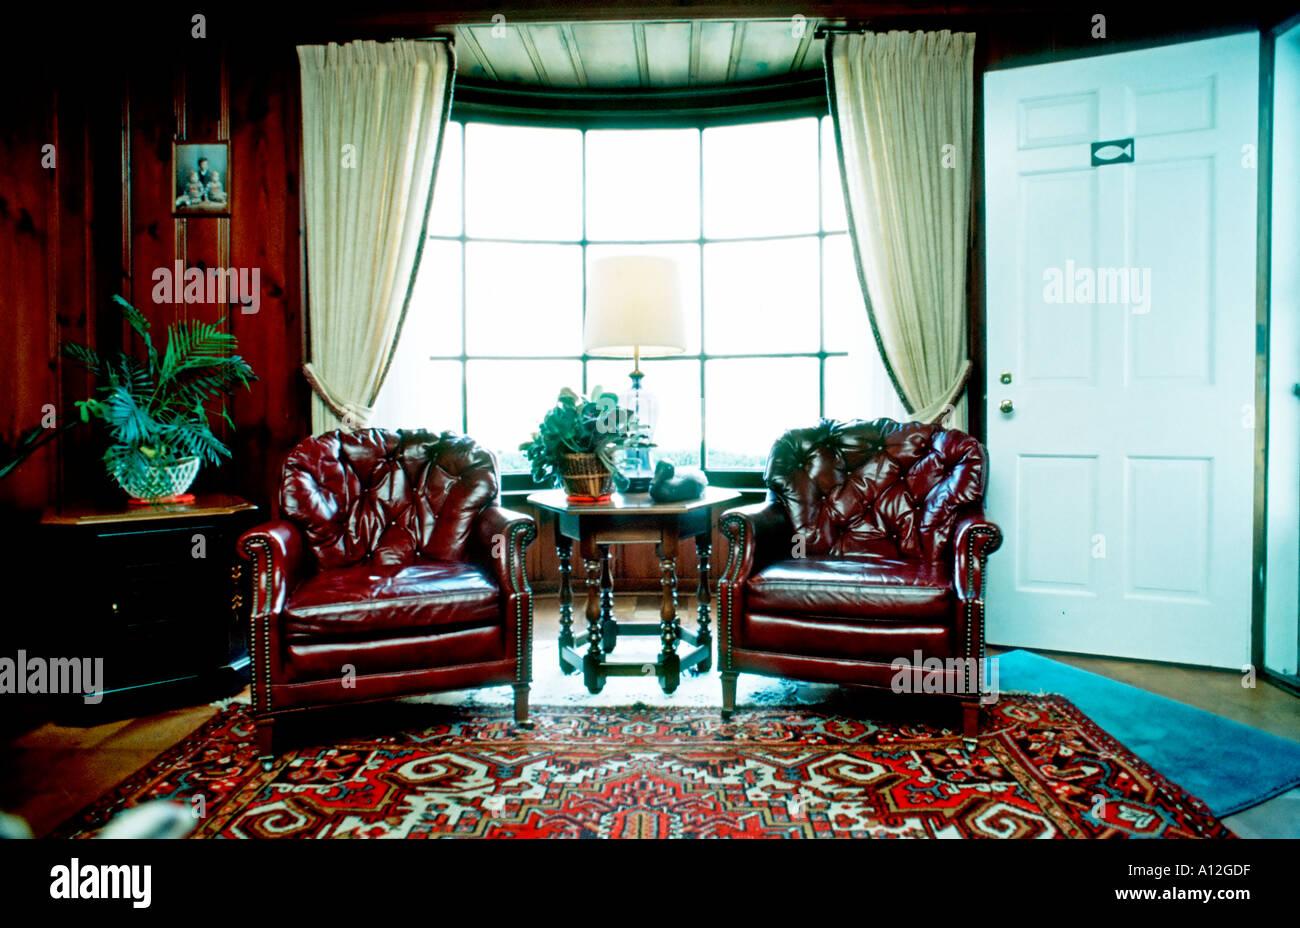 Investment USA American U0027Single Family Houseu0027 Interior Family Room U0027Stuffed  Chairsu0027 With